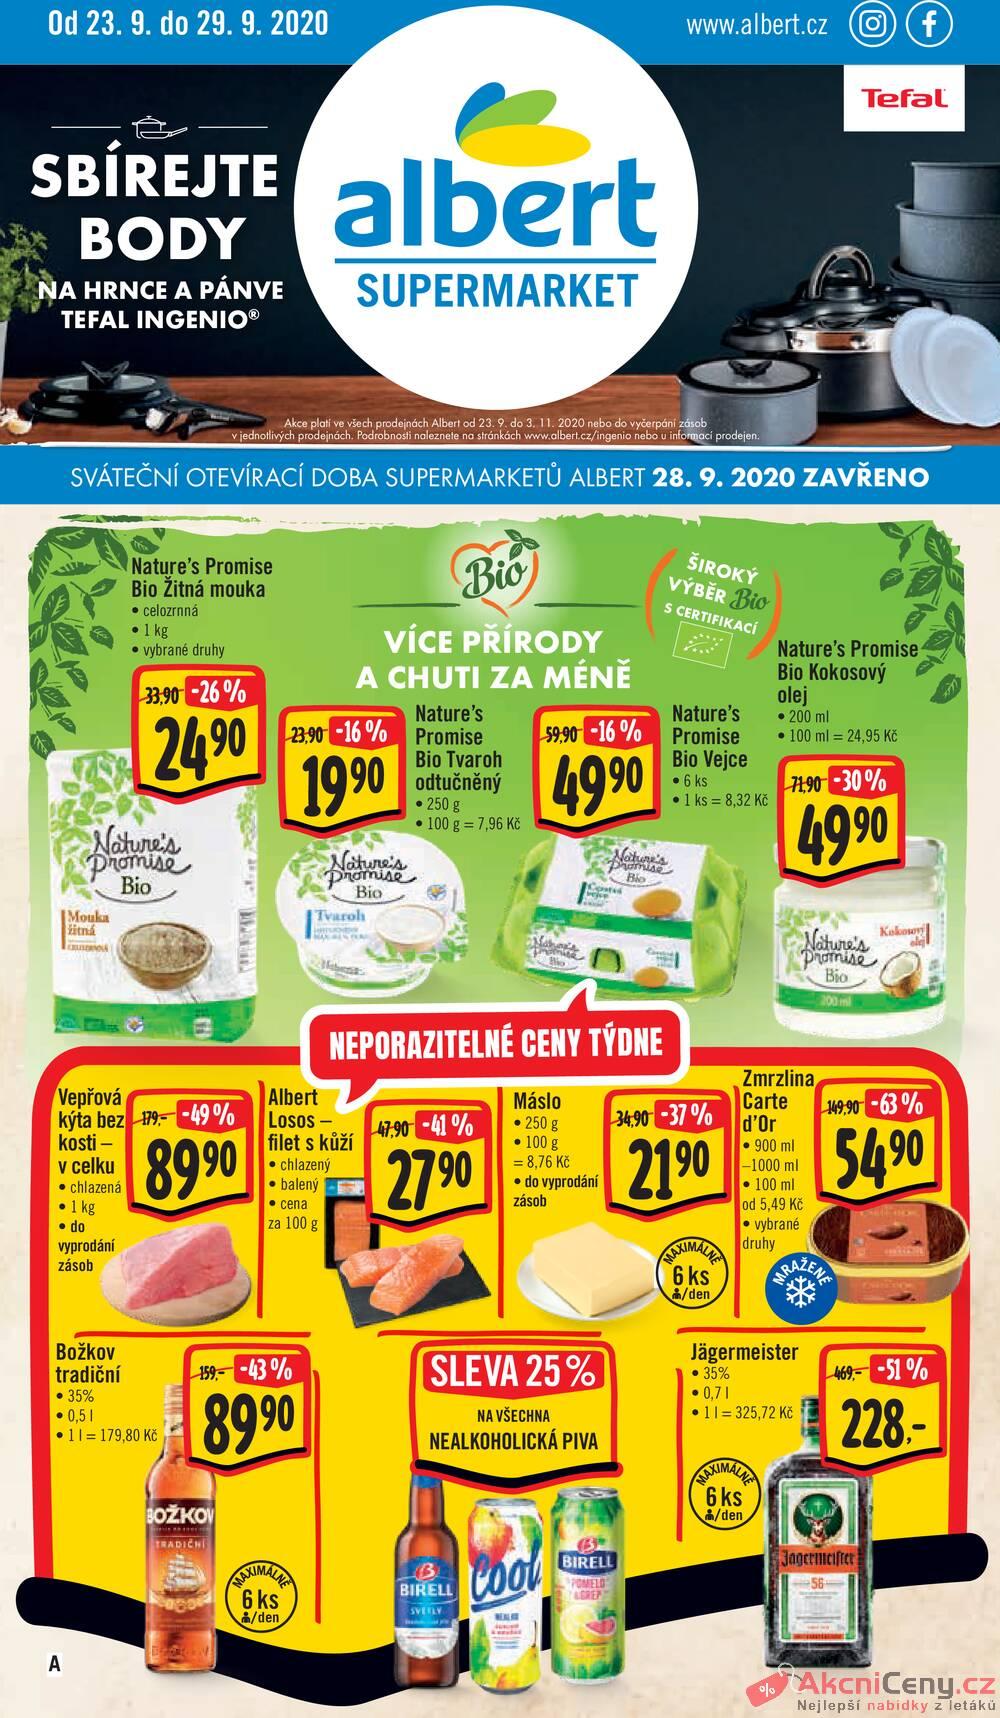 Albert Supermarket od 23.9. do 29.9.2020